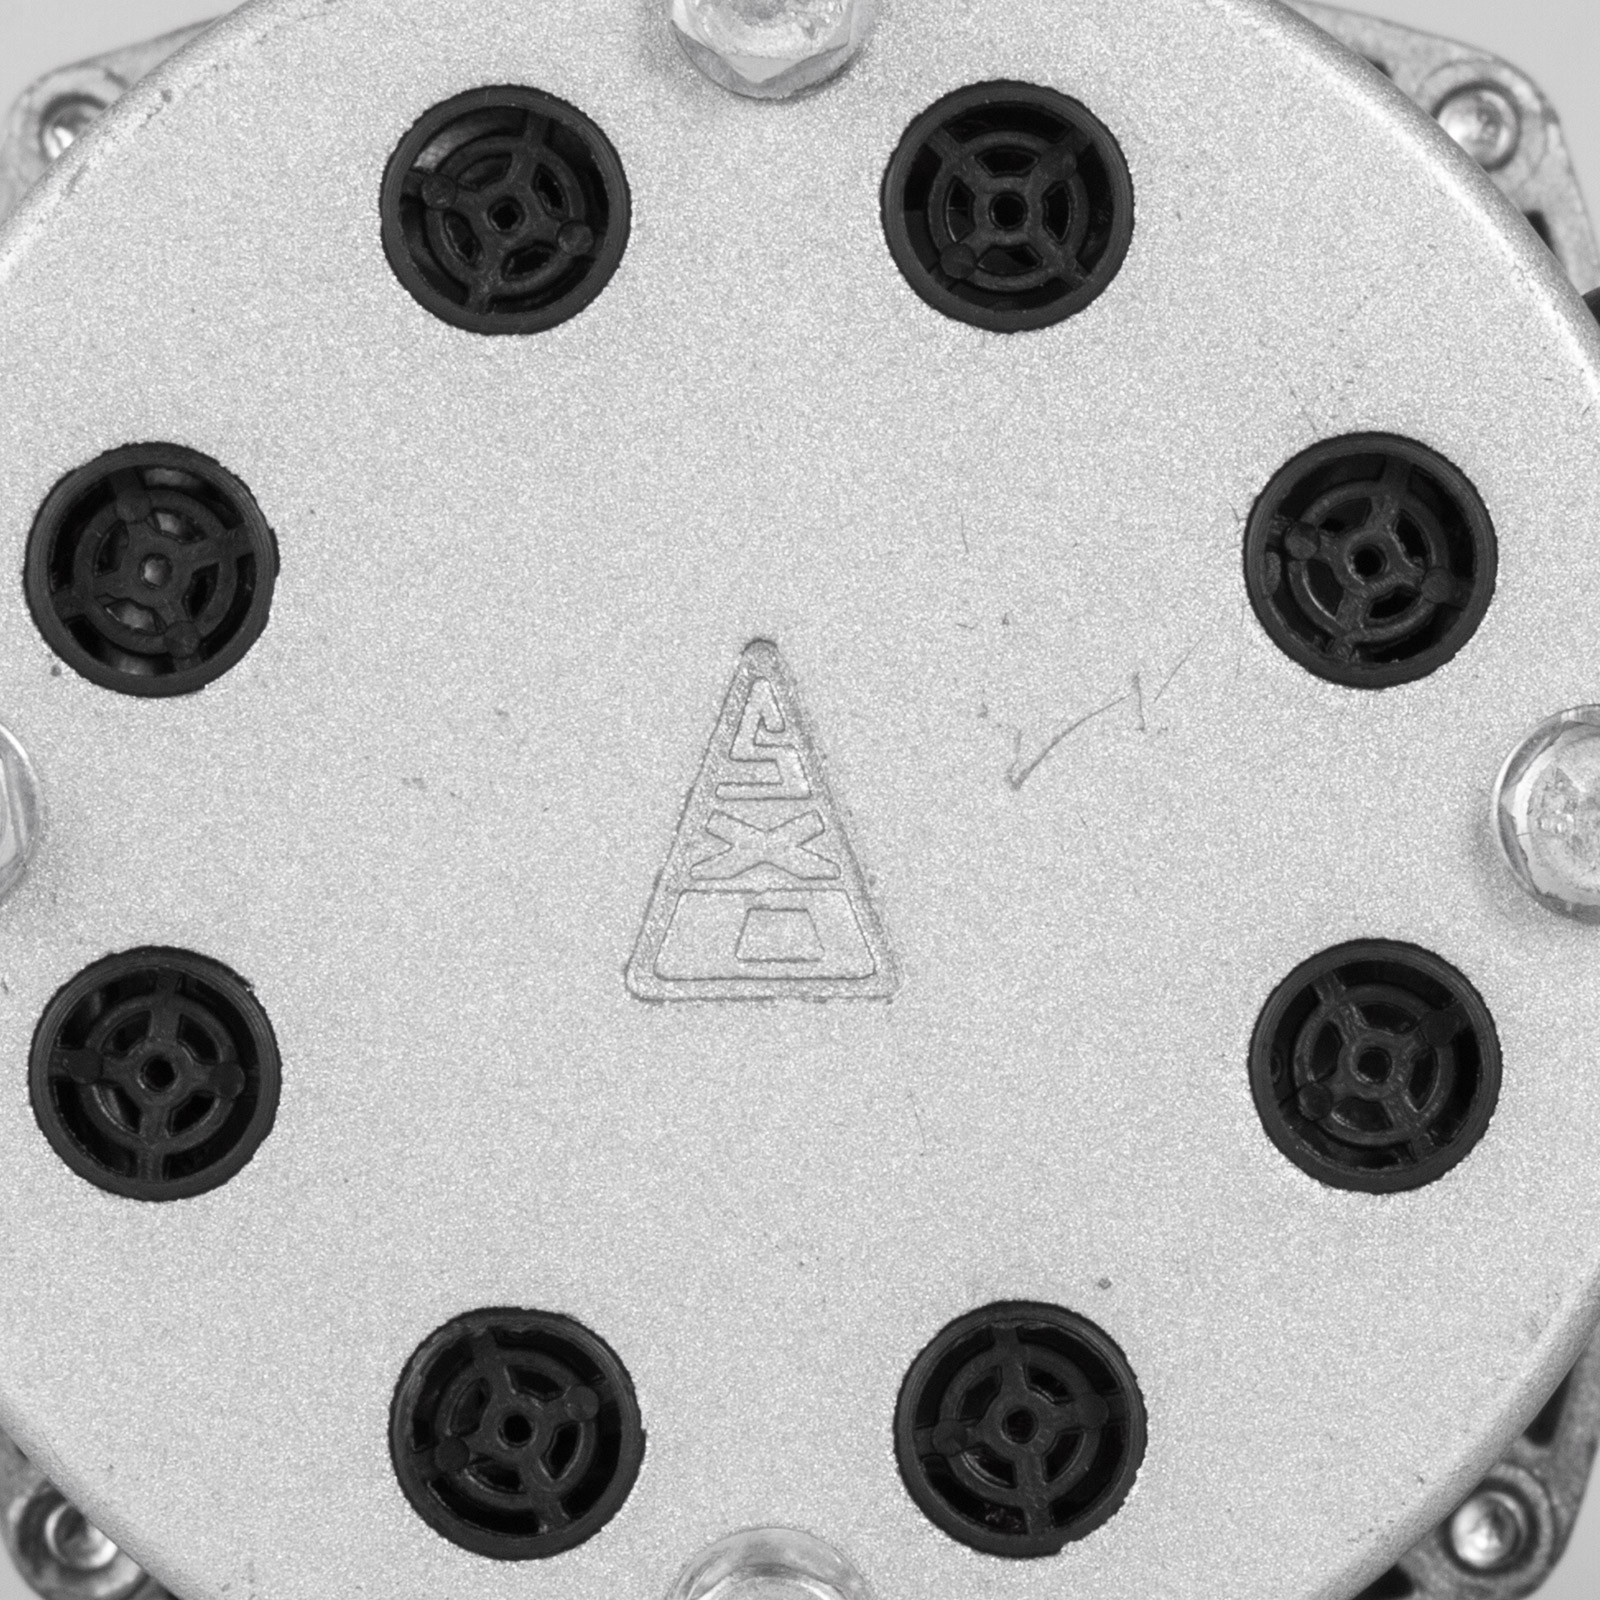 36v-Electric-Motor-controller-throttle-kit-f-Scooter-E-Scooter-ATV-Permanent thumbnail 70